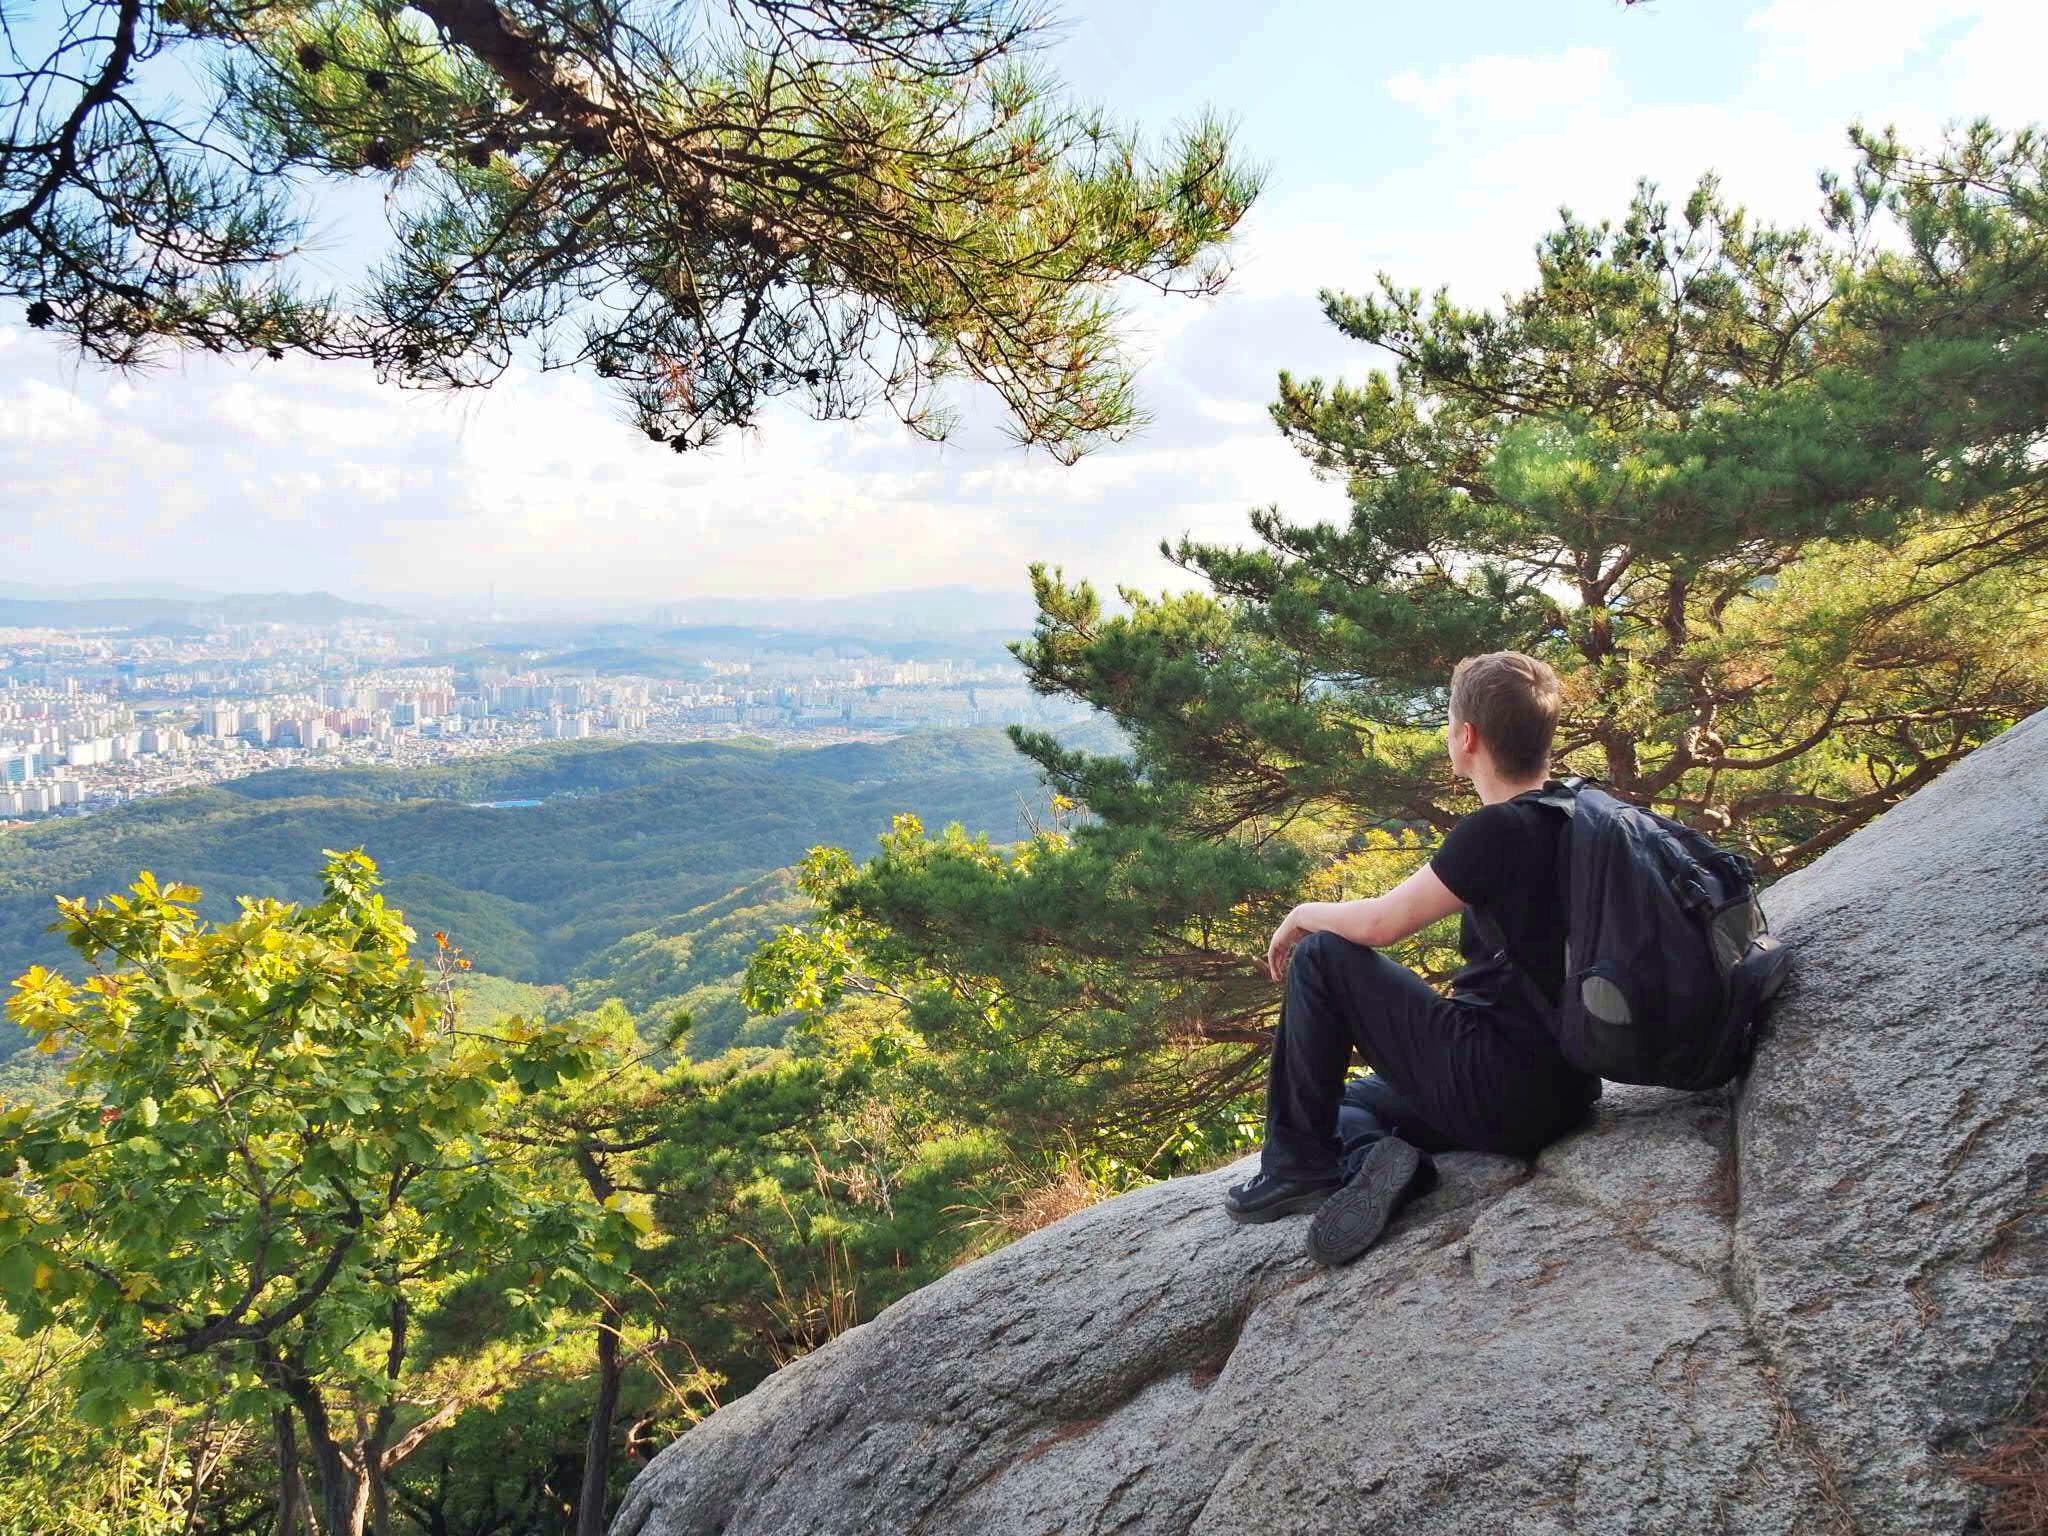 Vincent Seoul Hiking South Korea Fitness on the Road.jpg